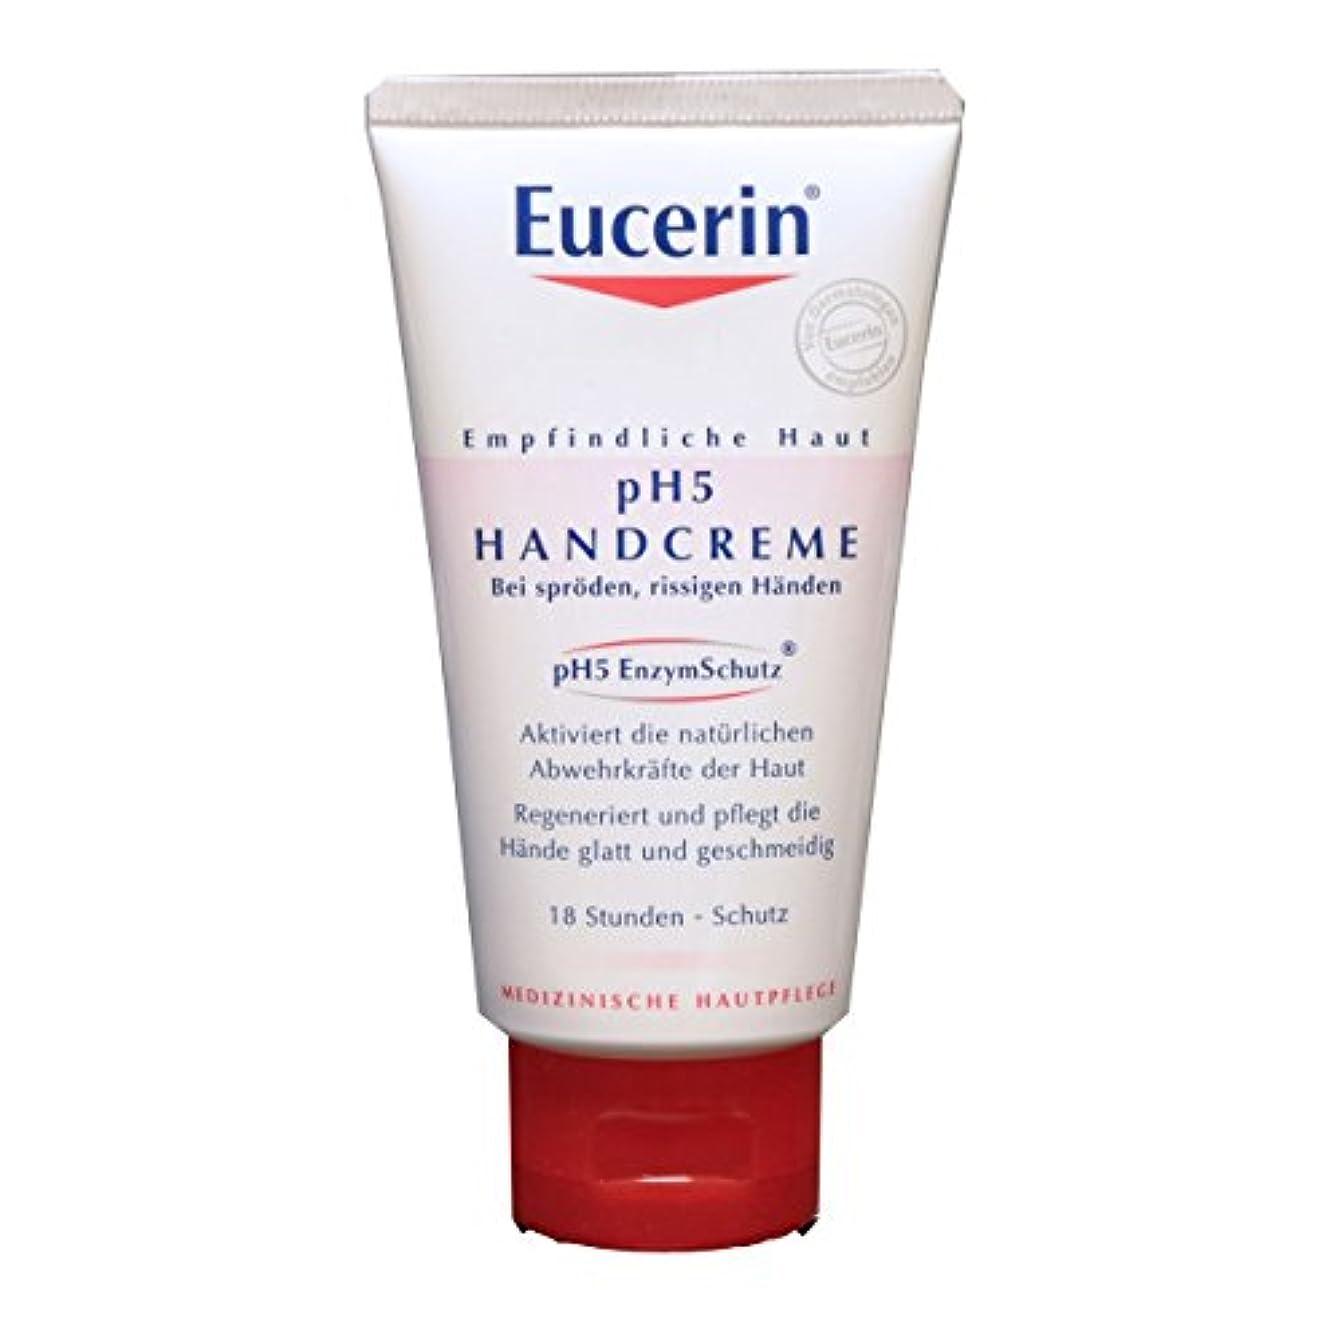 奨学金雇う奨学金Eucerin Ph5 Hand Cream 75ml [並行輸入品]